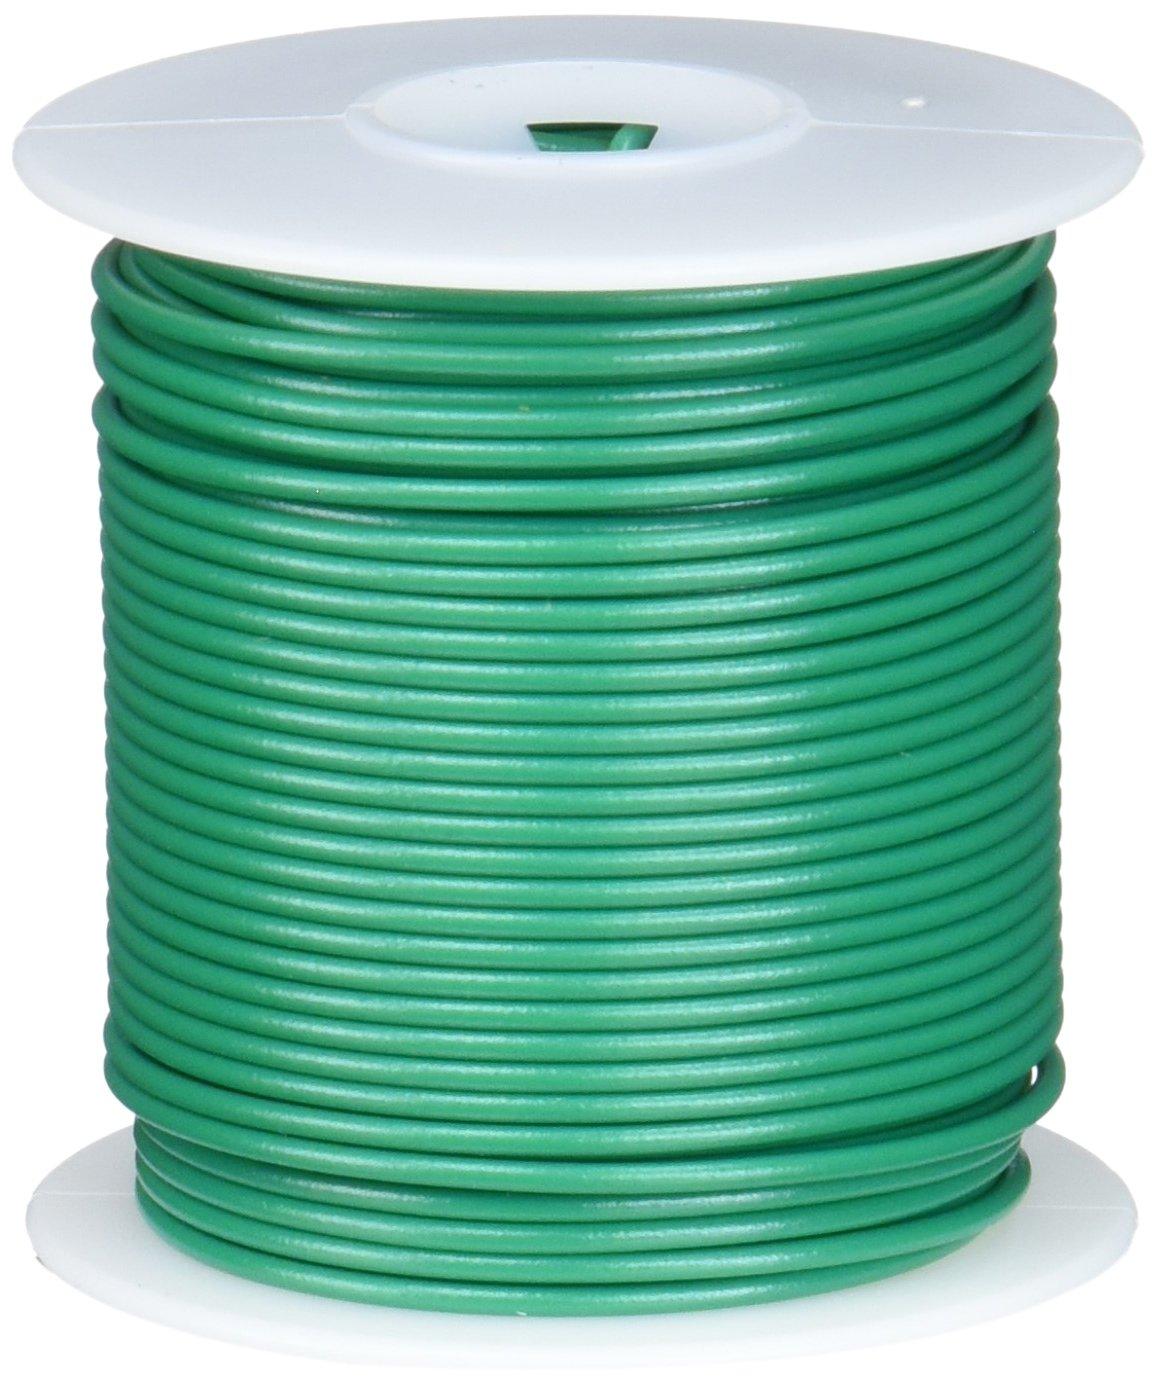 Remington Industries 22UL1007SLDGRE UL1007 22 AWG Gauge Solid Hook-Up Wire, 300V, 0.0253'' Diameter, 100' Length, Green